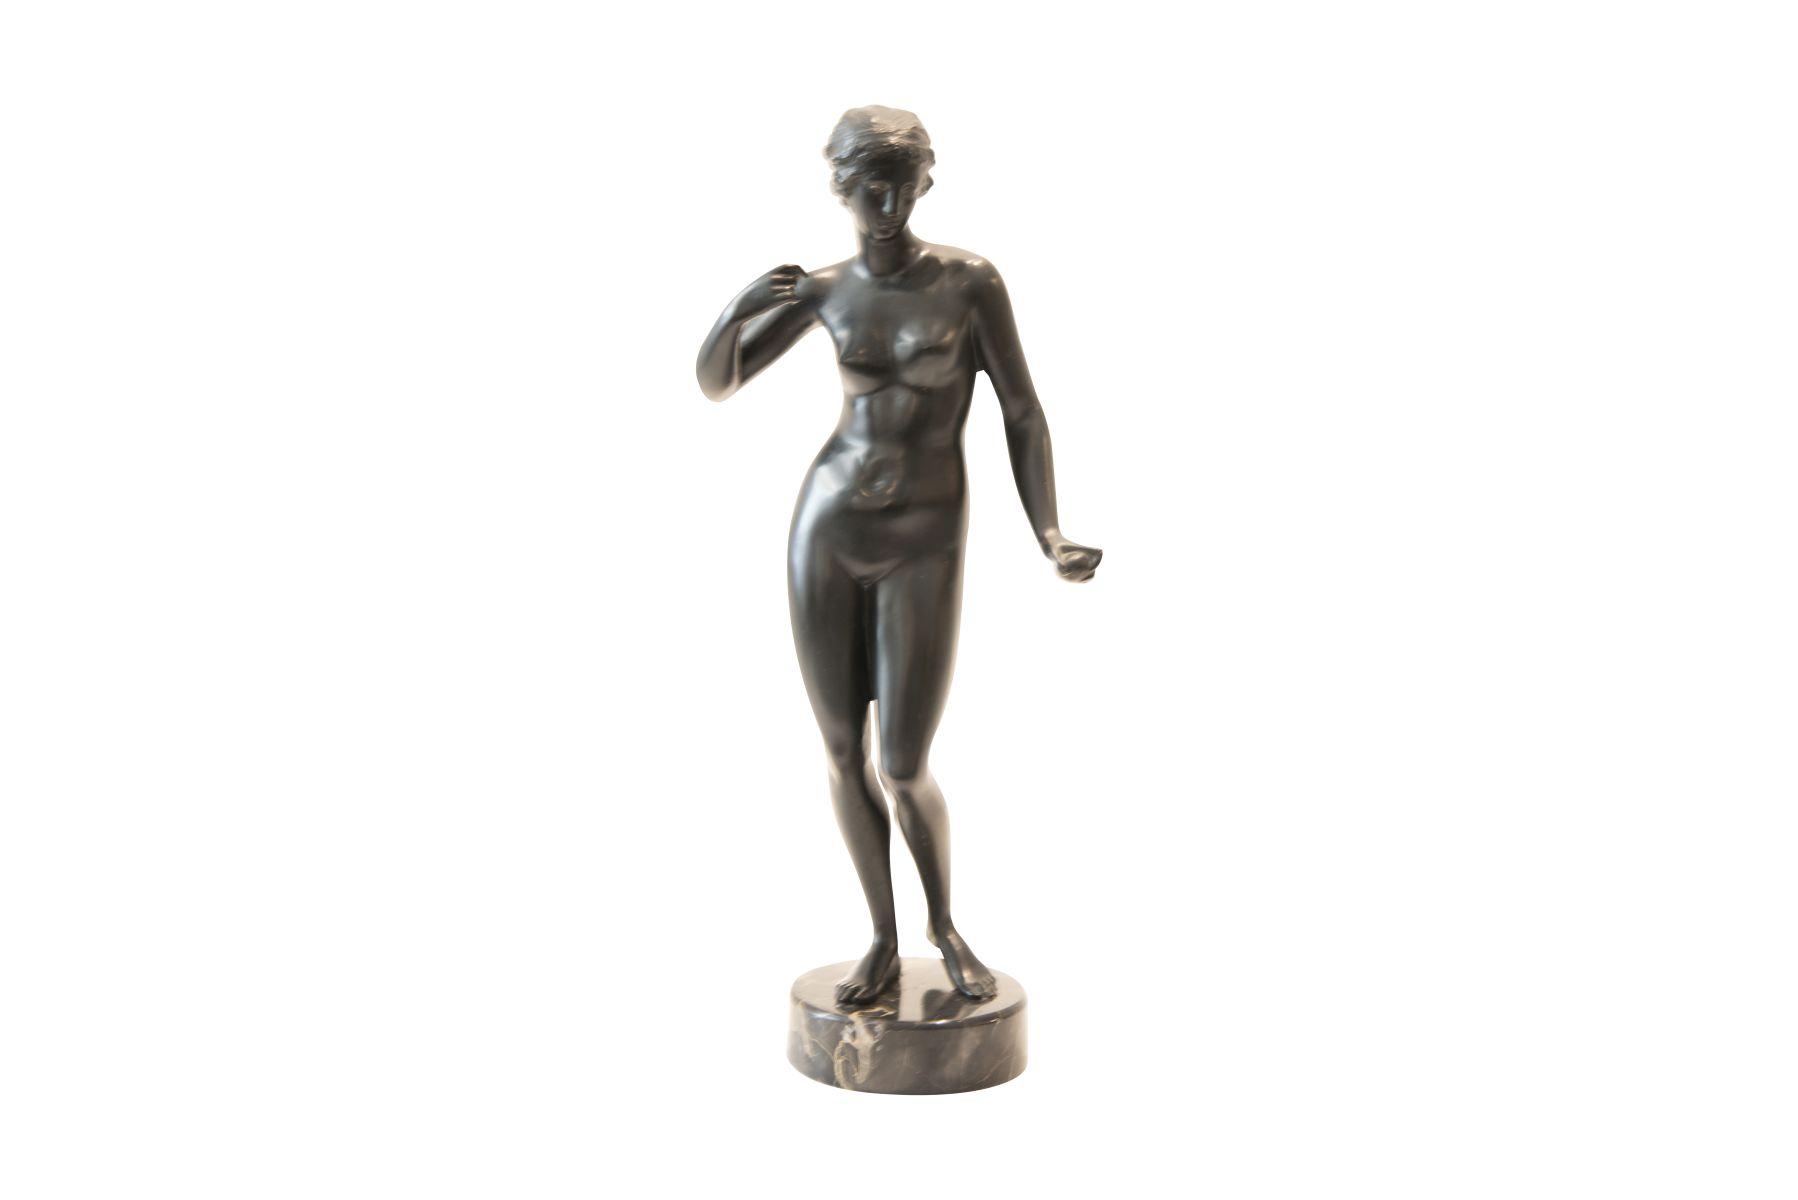 #206 Female Nude on Marble Base | Weiblicher Akt auf Marmorsockel Image